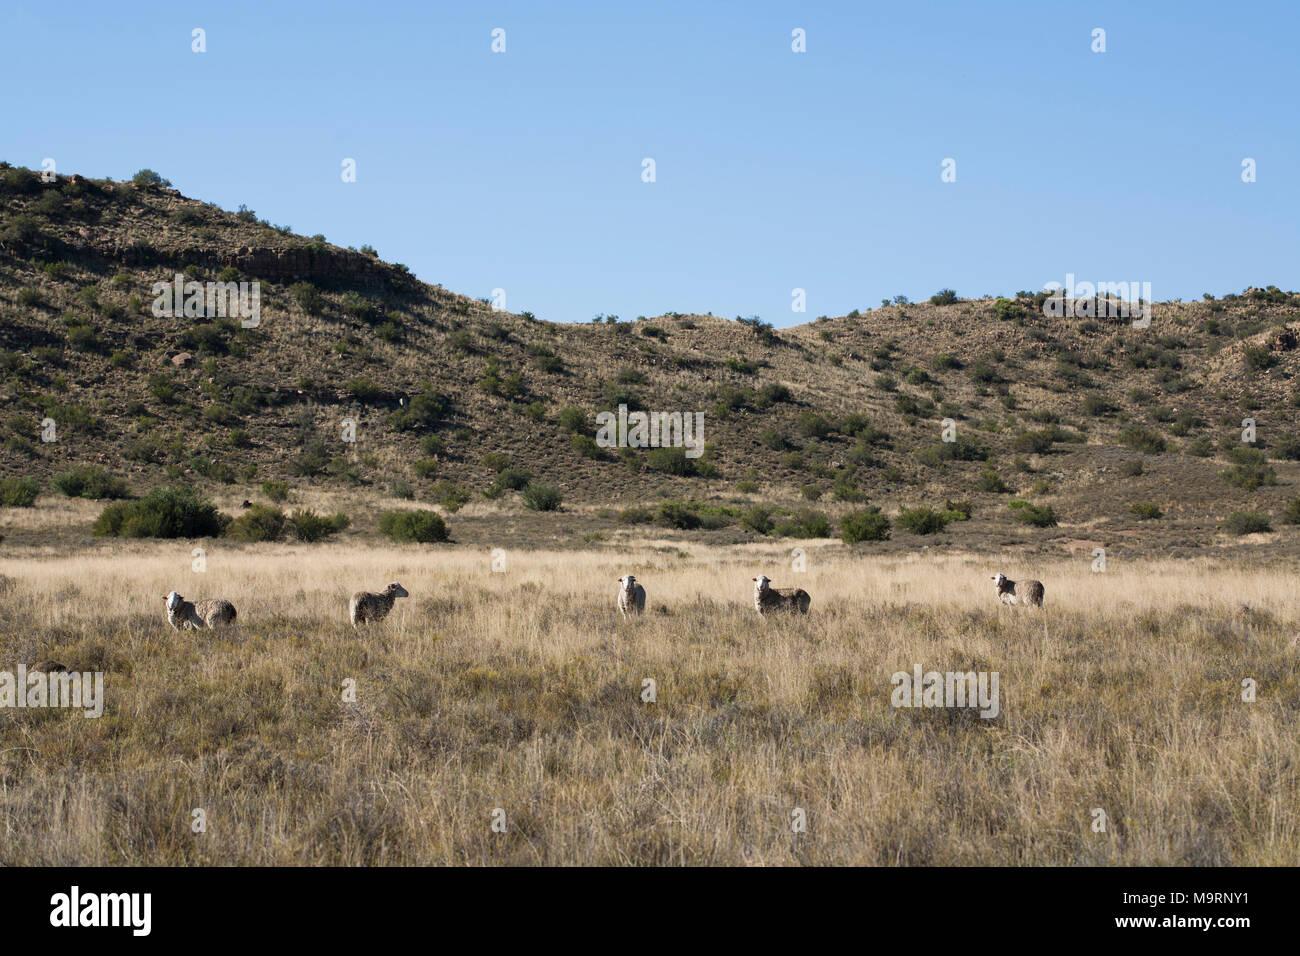 Merino sheep in the grassy veld on a sheep farm in the Karoo. - Stock Image